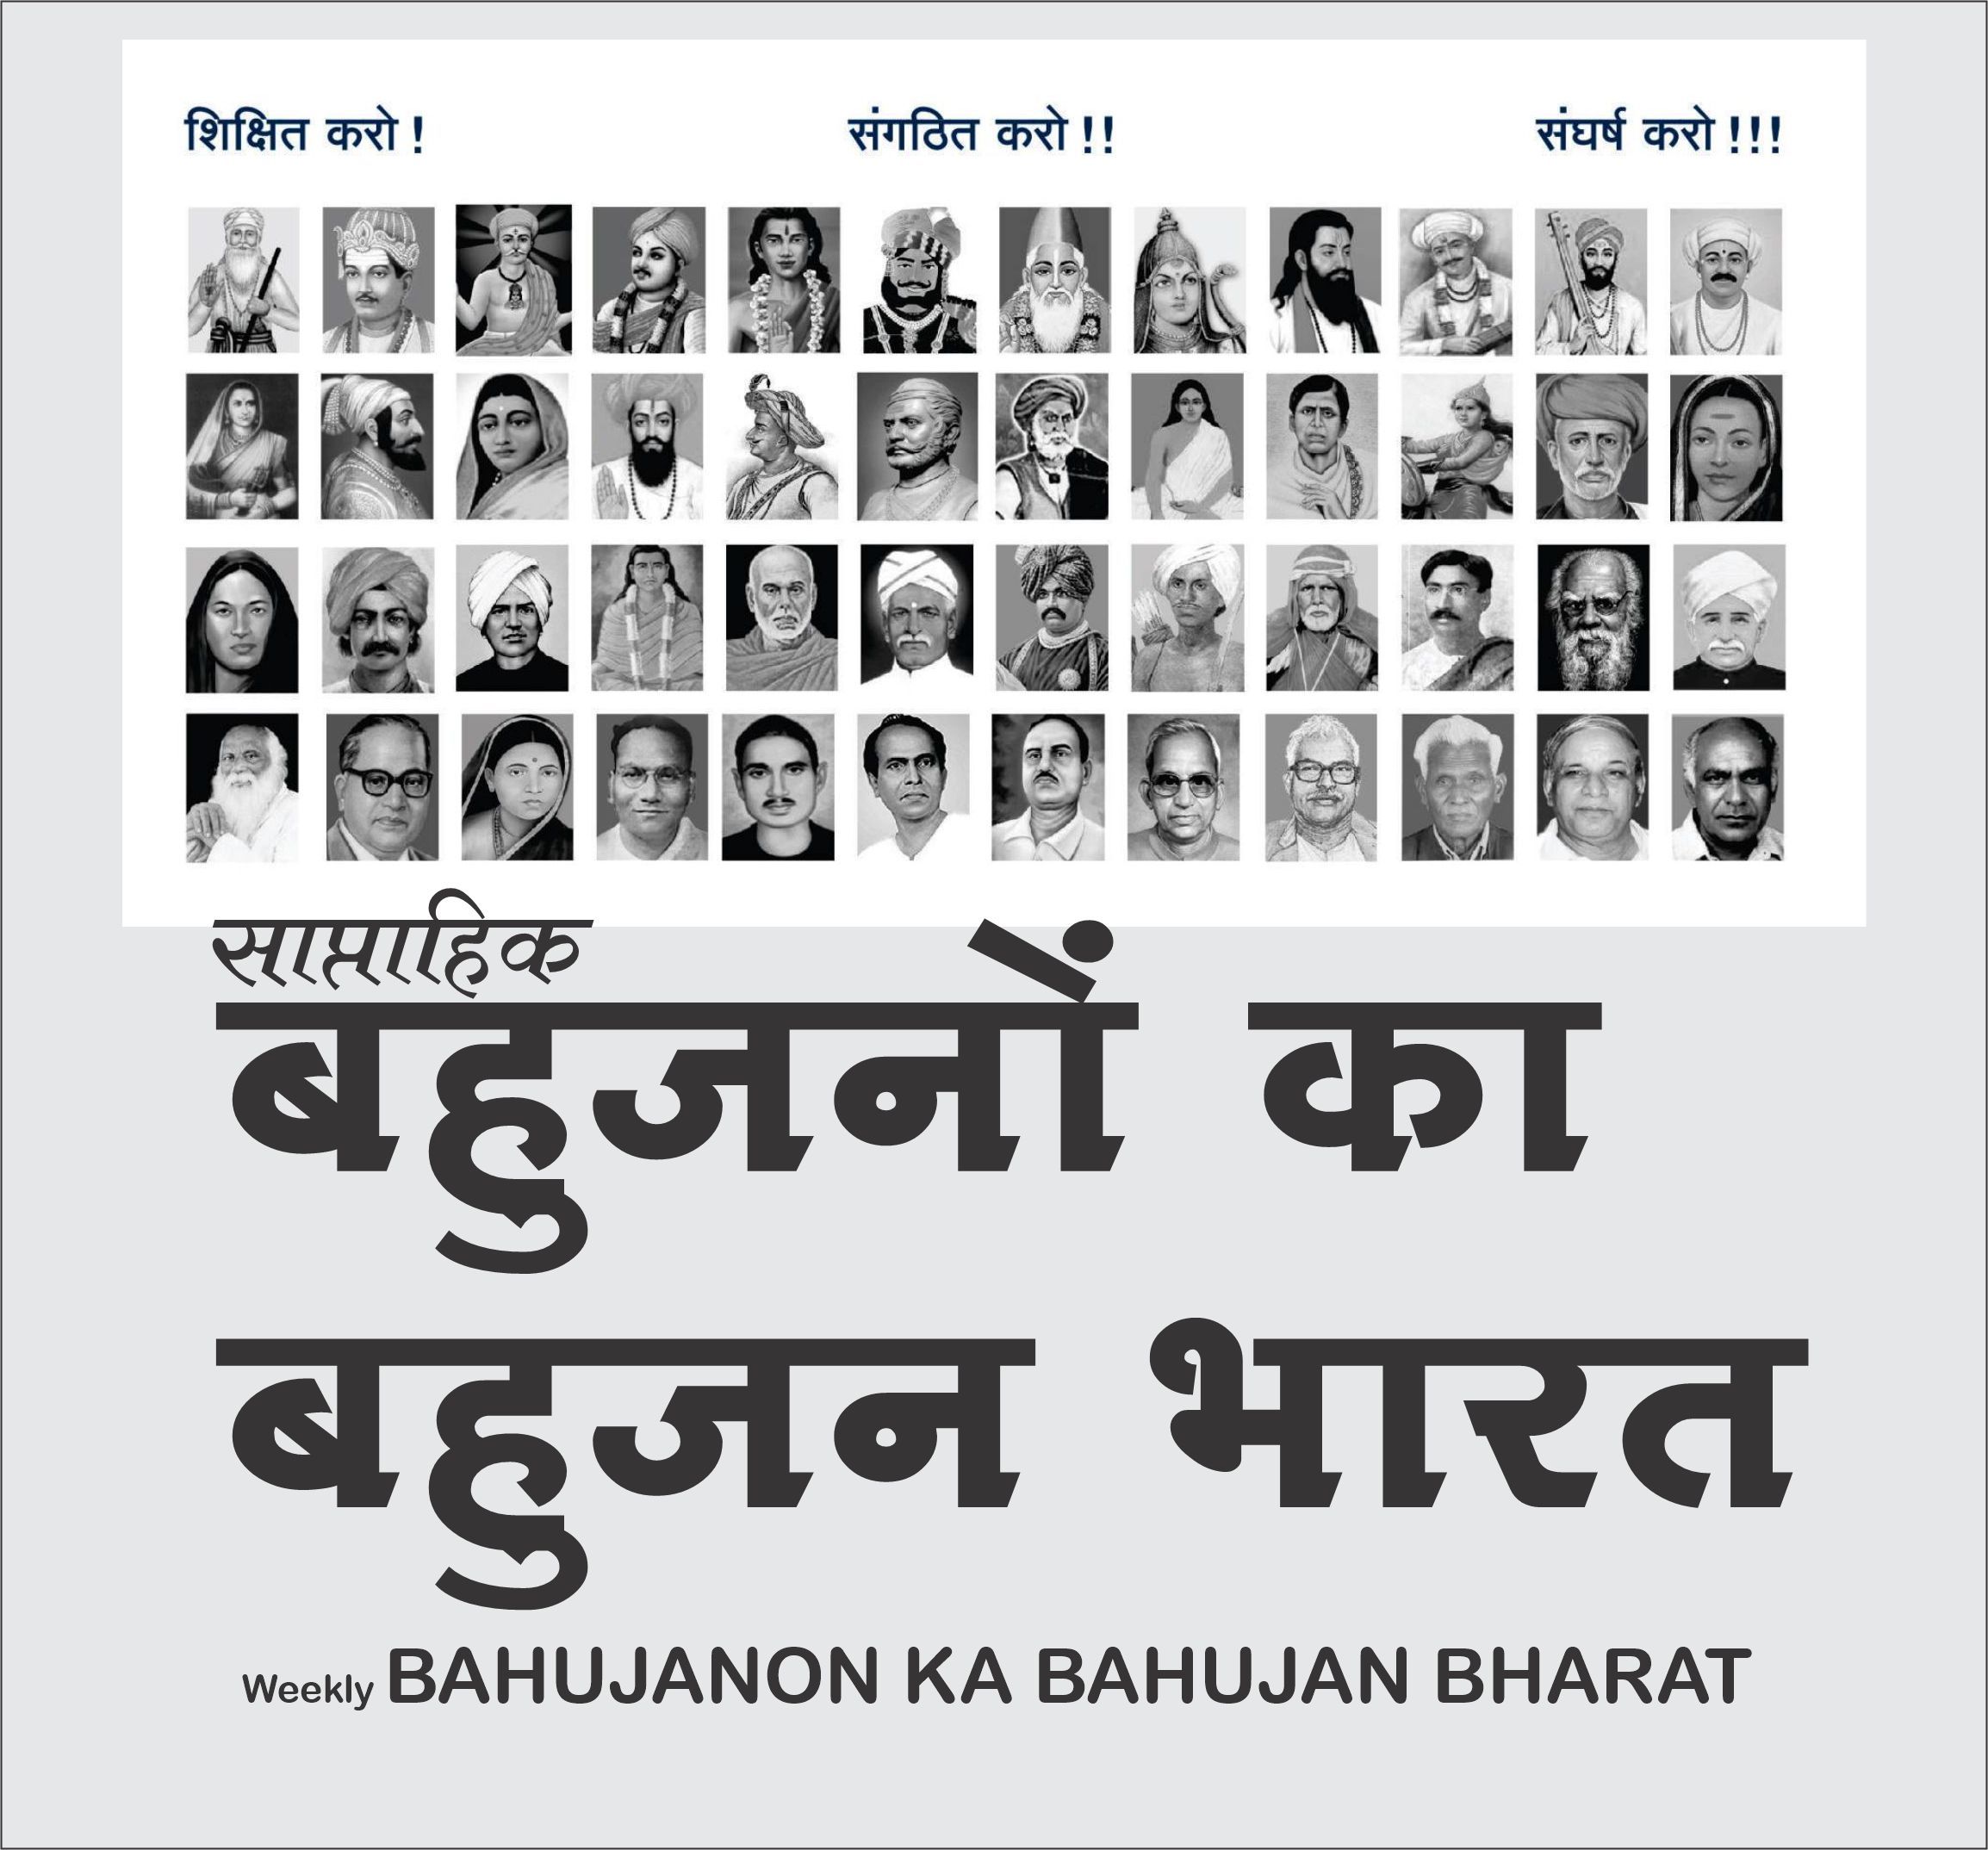 Bahujano ka Bahujan Bharat – Weekly 07 Dec. to 12 Dec. 2020